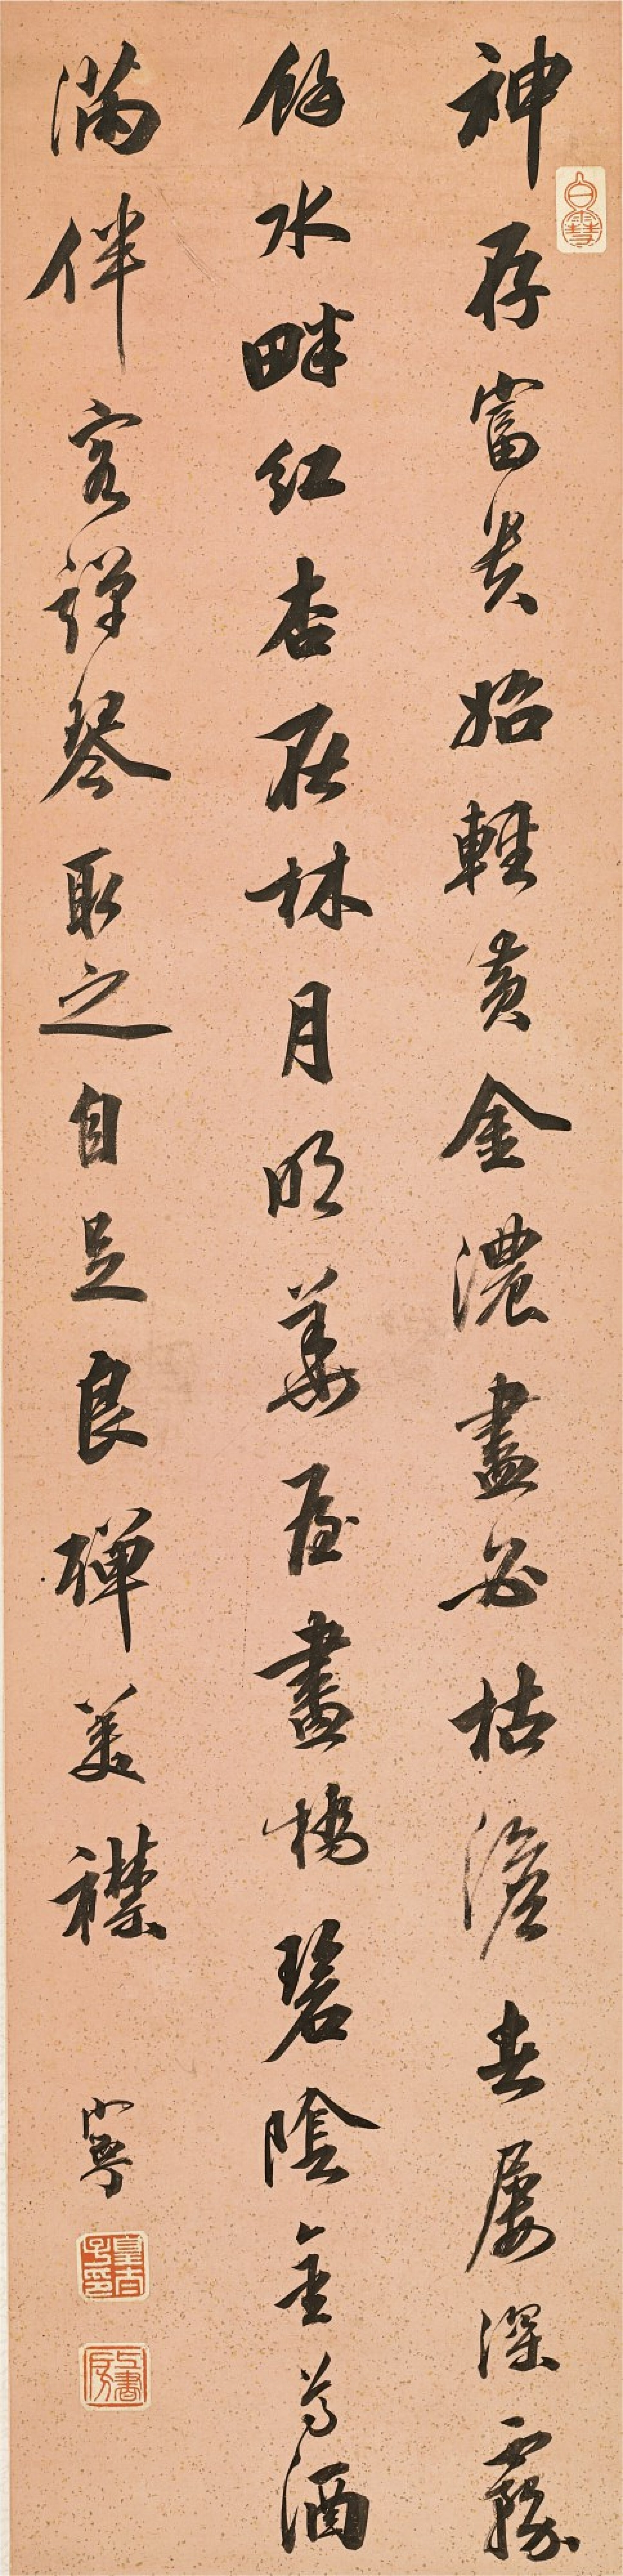 View full screen - View 1 of Lot 3113. Emperor Daoguang (1782-1850) 綿寧(道光帝)  1782-1850   Calligraphy in Running Script 行書節錄《二十四詩品‧綺麗》.